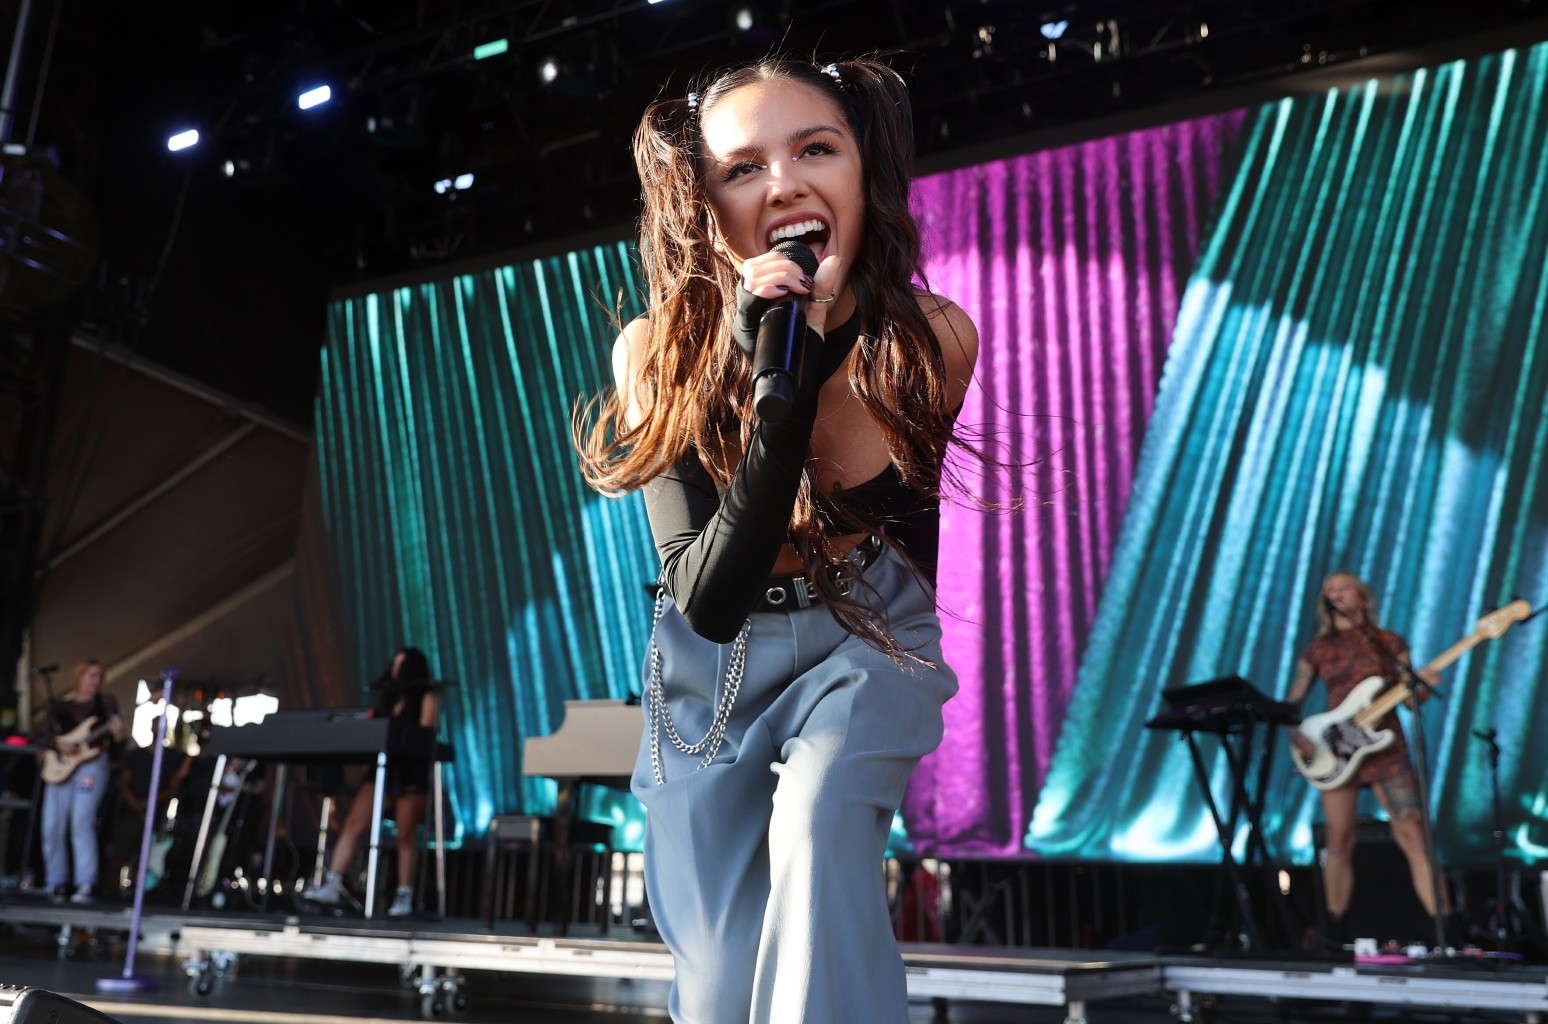 Olivia Rodrigo's 'First Show' at 2021 iHeartRadio Music Festival